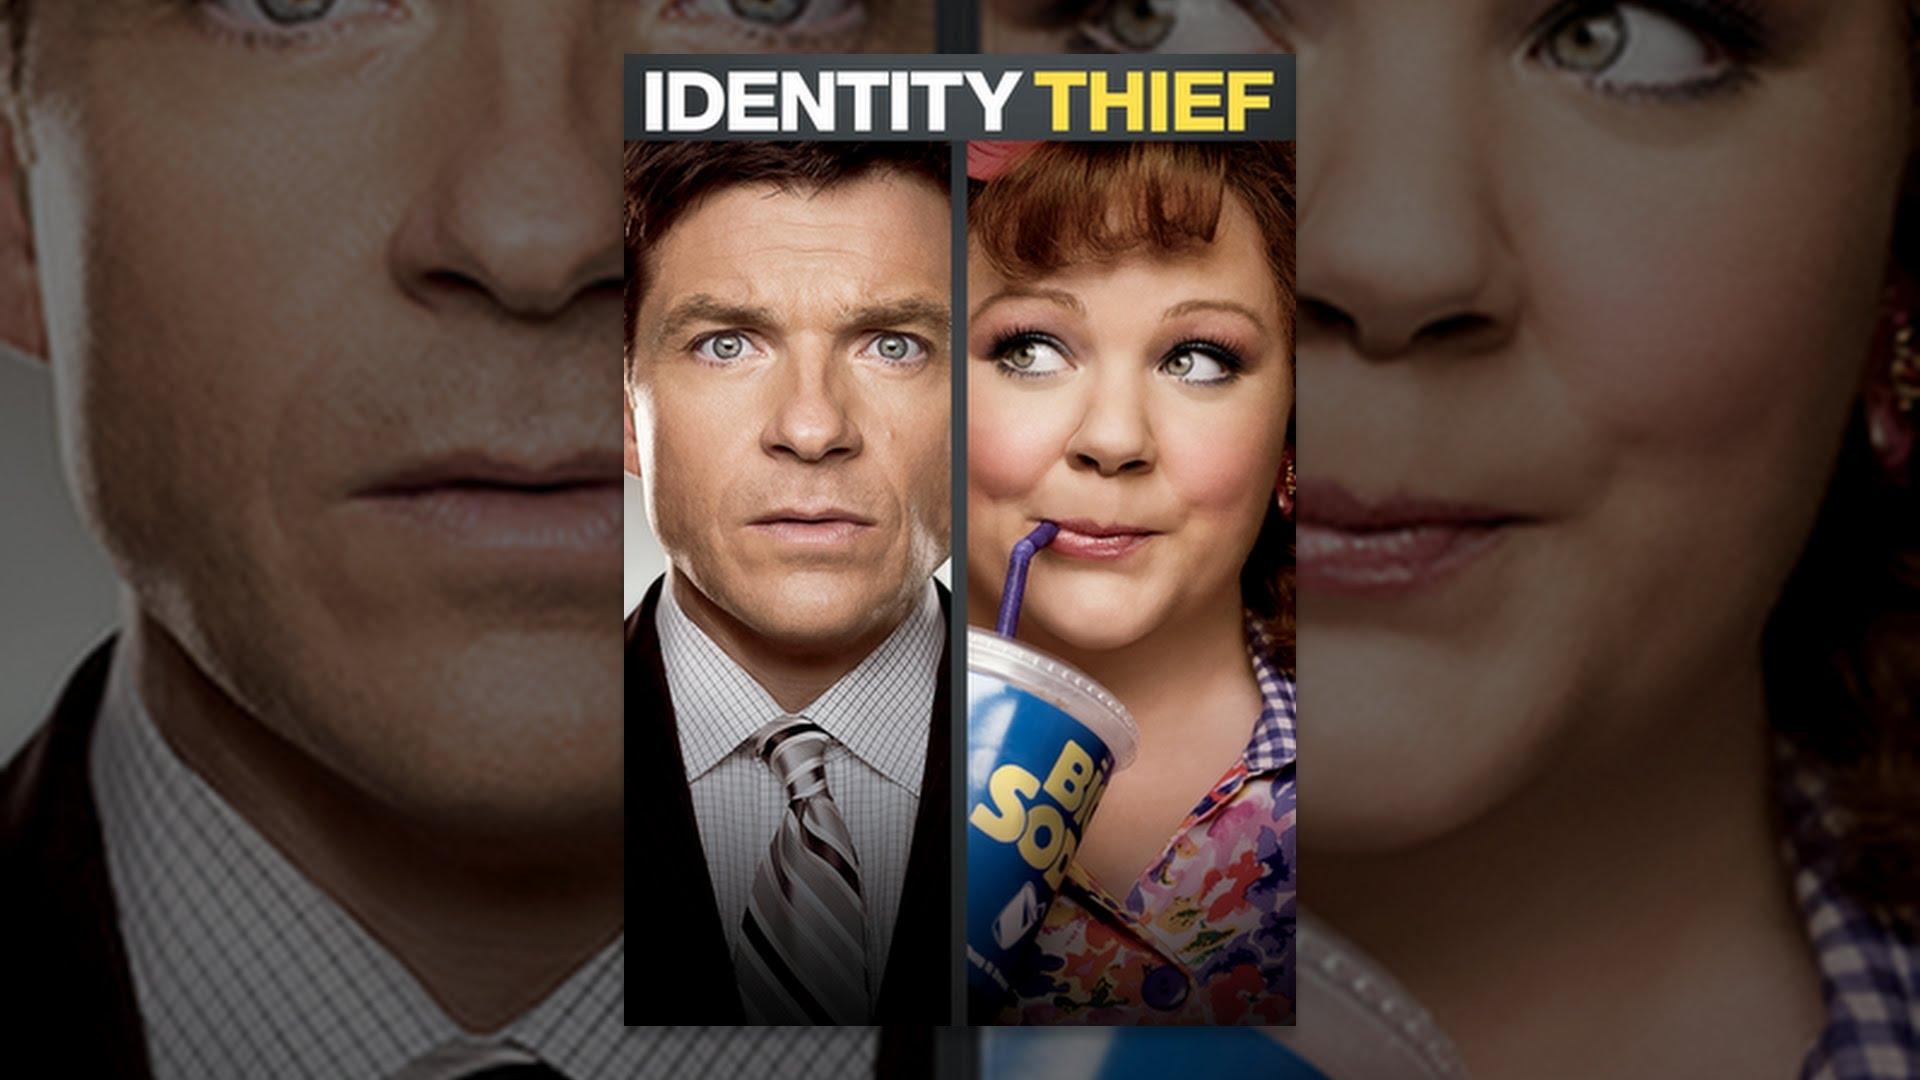 ac youtube identity thief